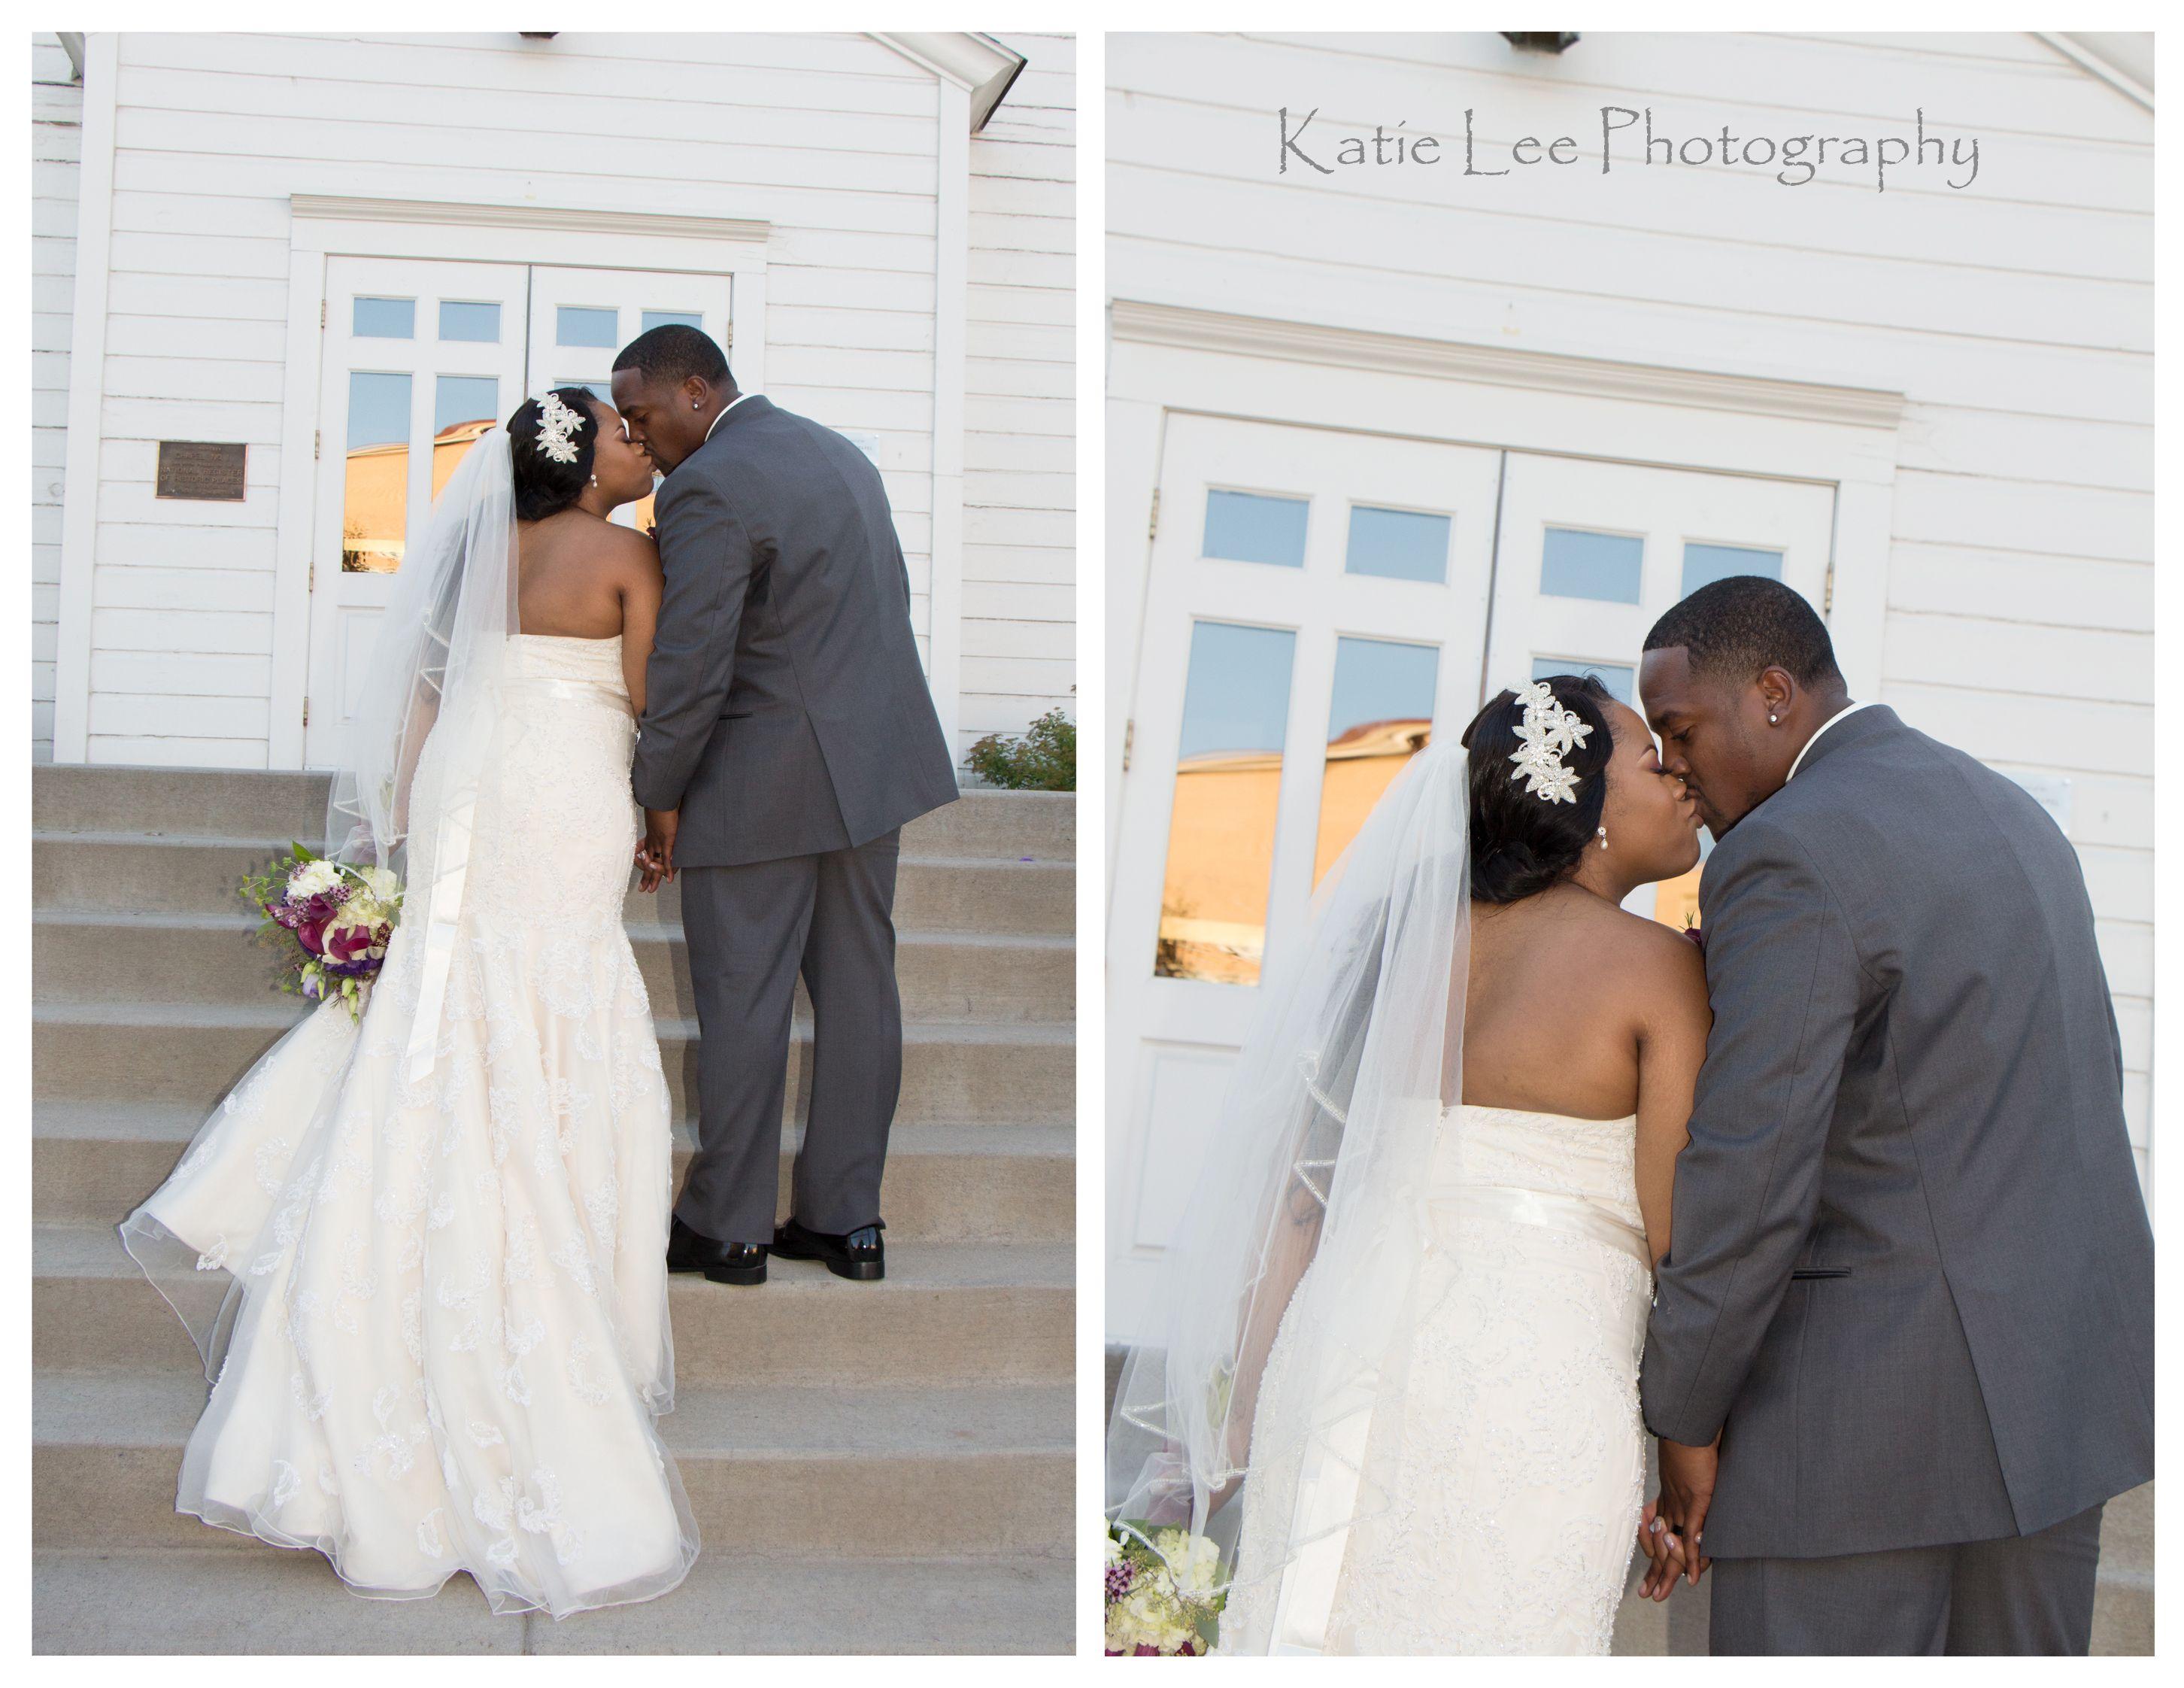 All white church wedding decor Church Wedding Bride and Groom Photo Wedding Photography